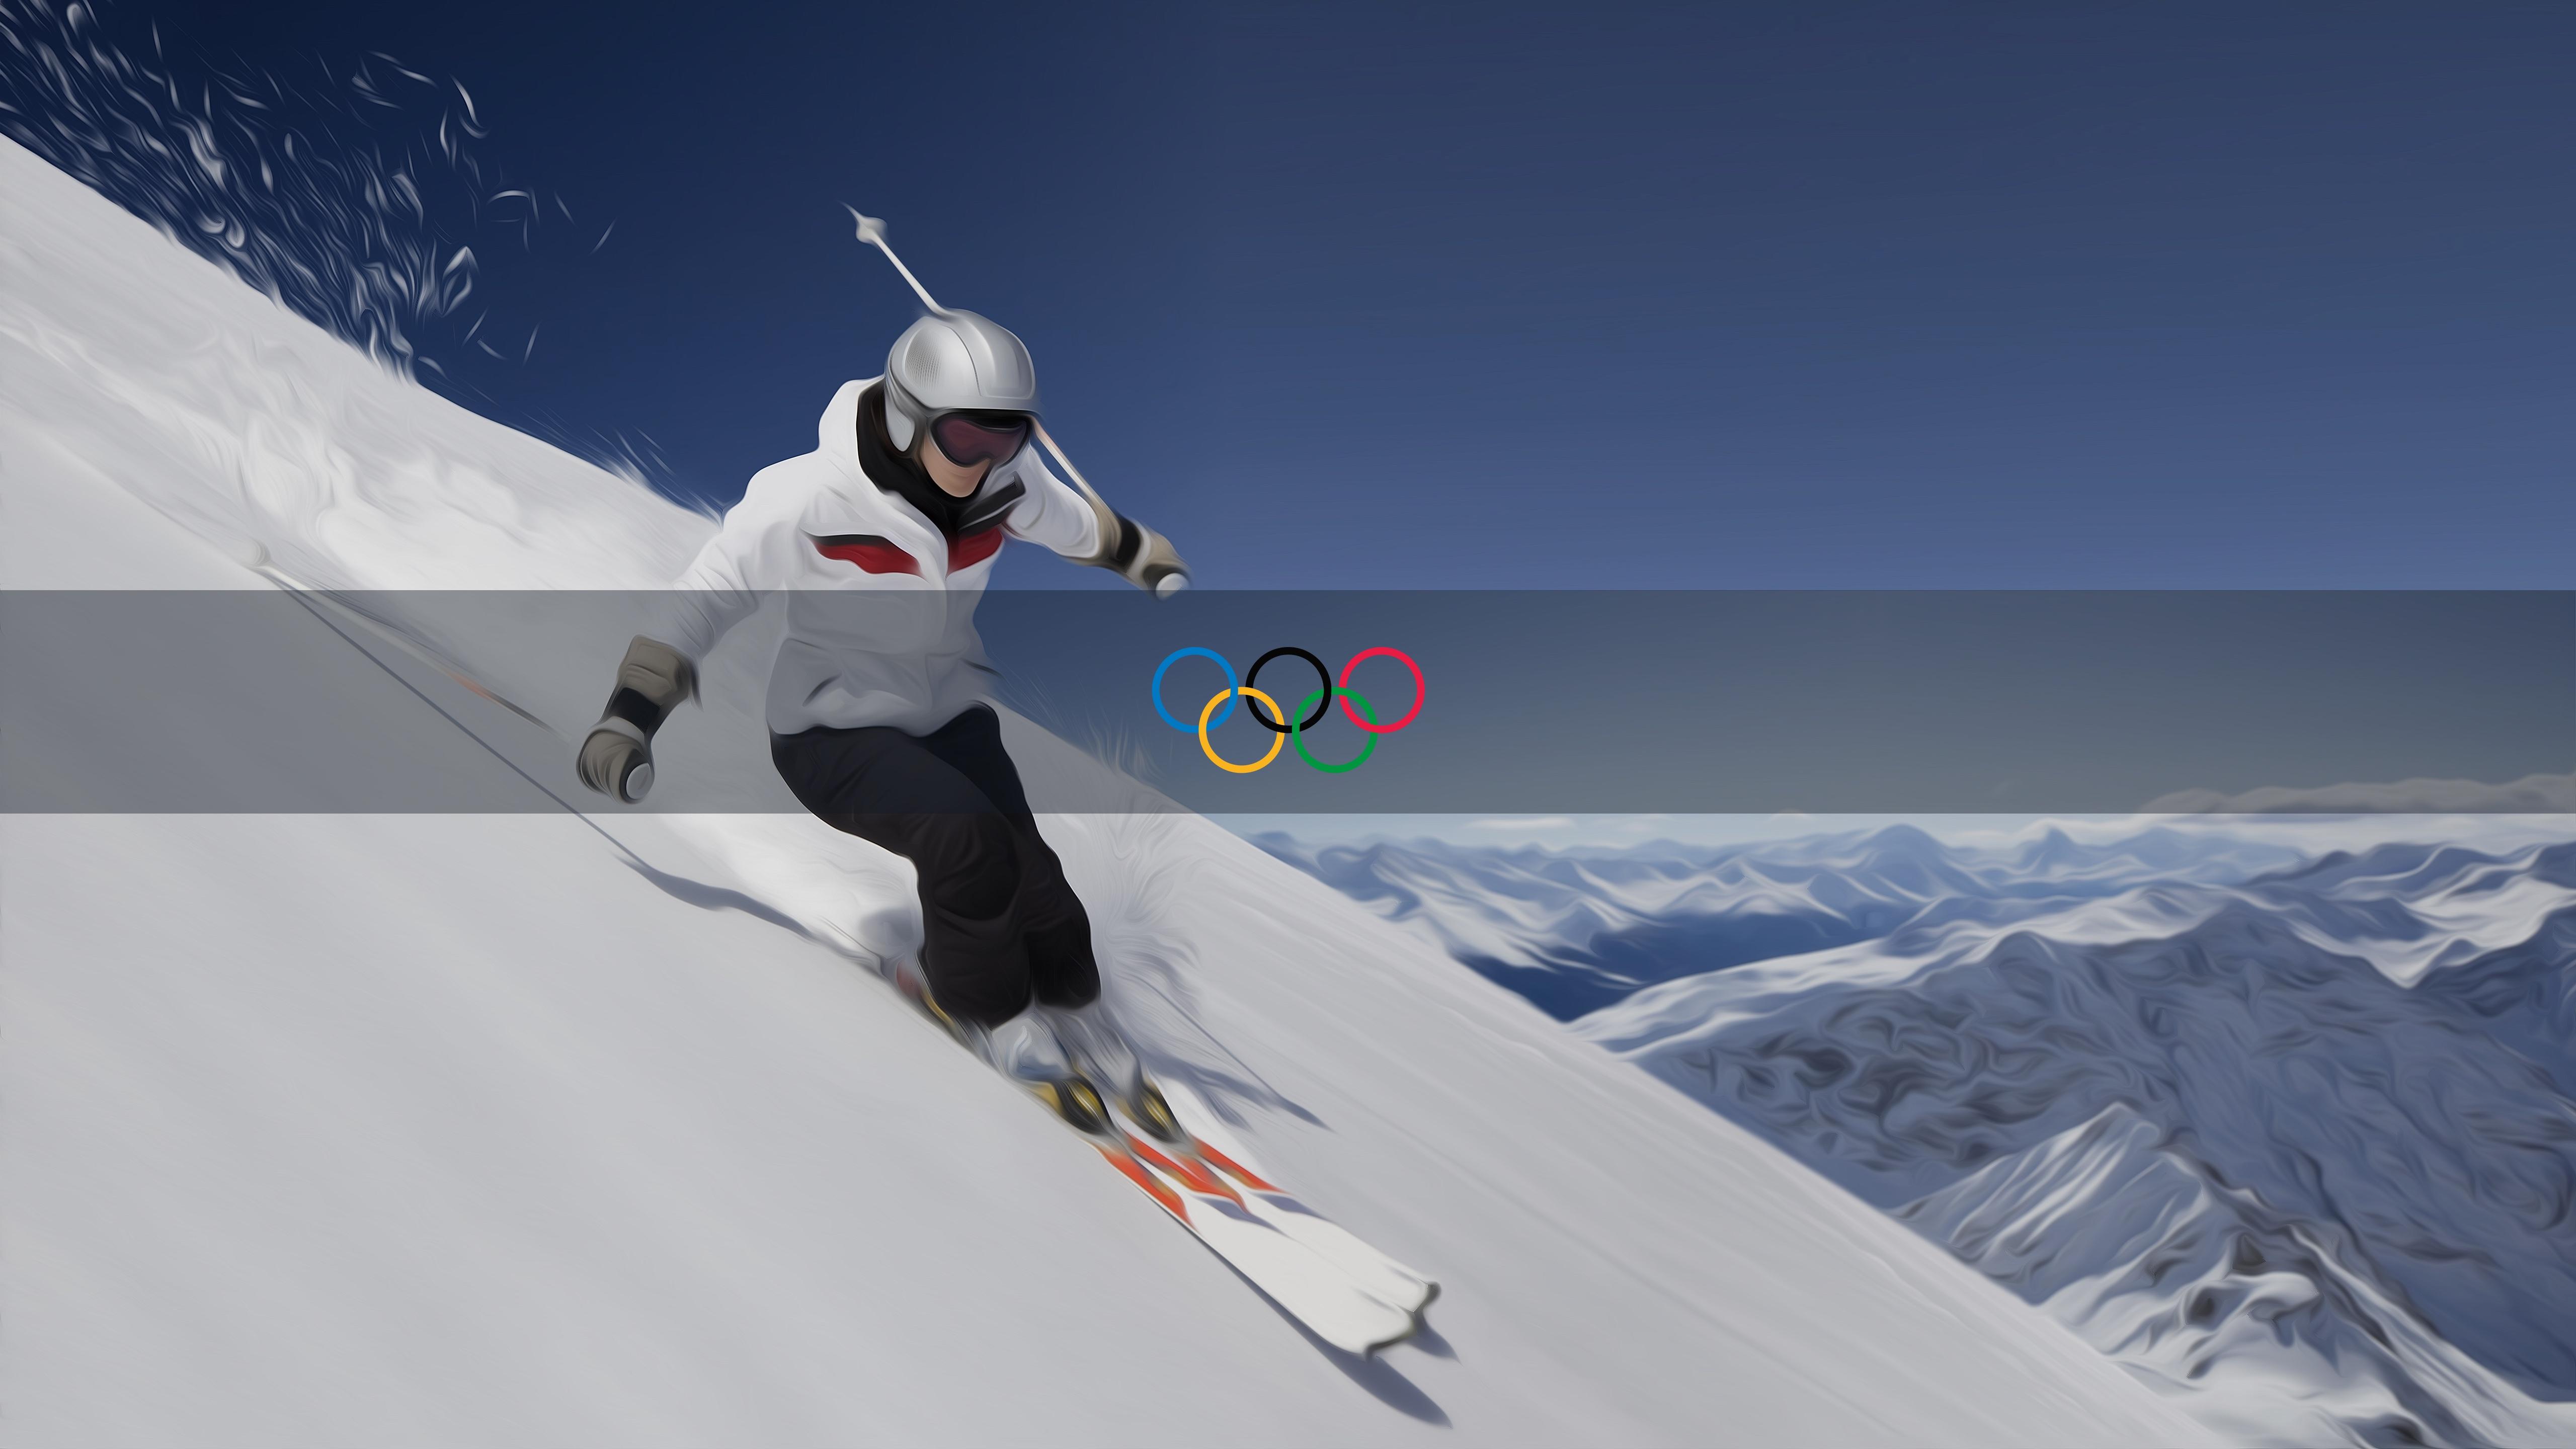 Pyeongchang Winter Olympics Wallpaper